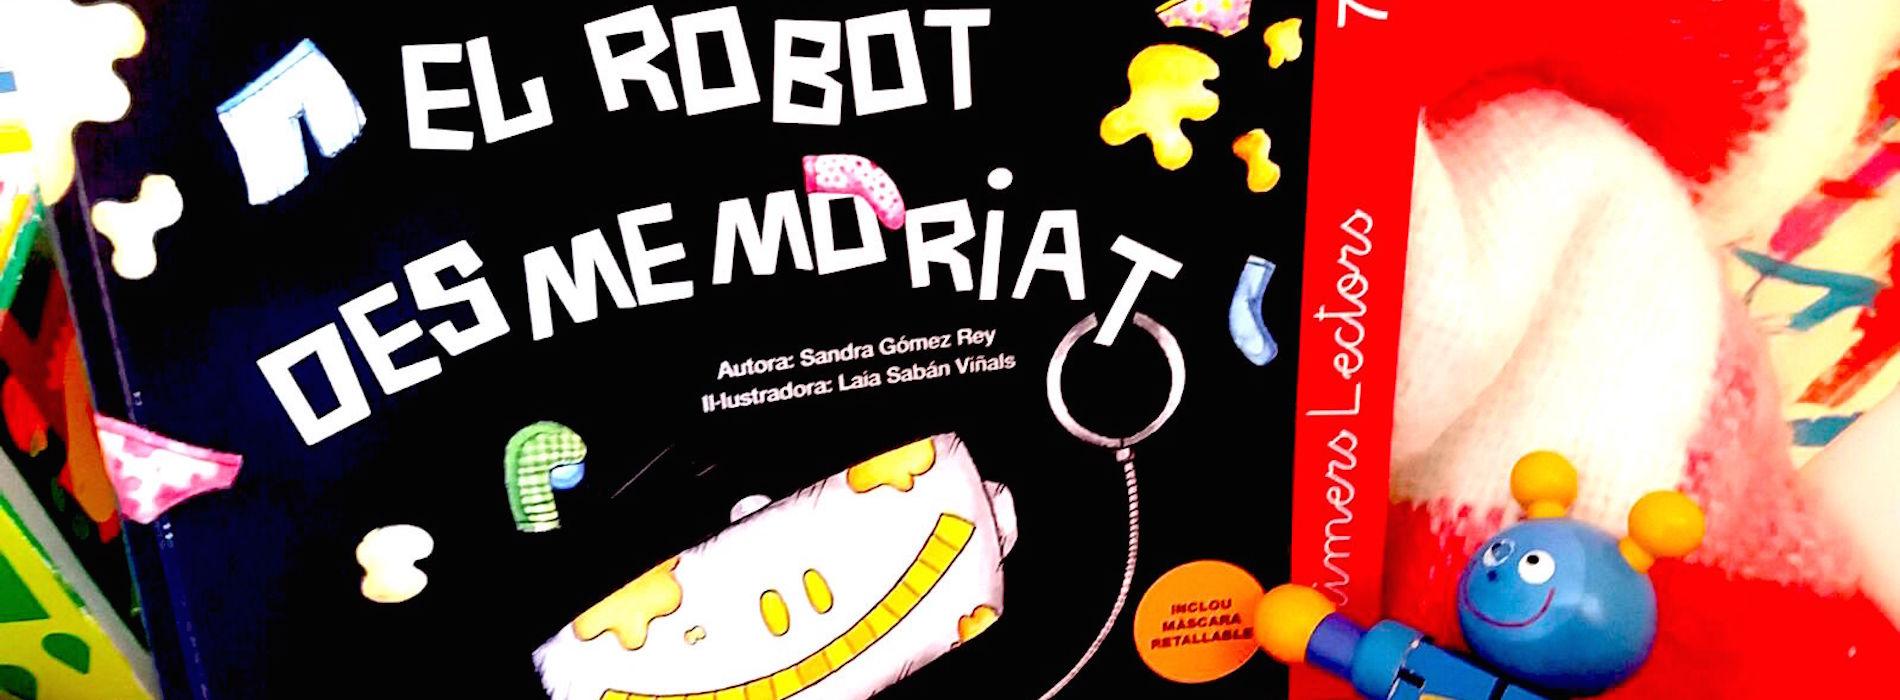 conte-sandra-gomez-robot-creativitat-memoria